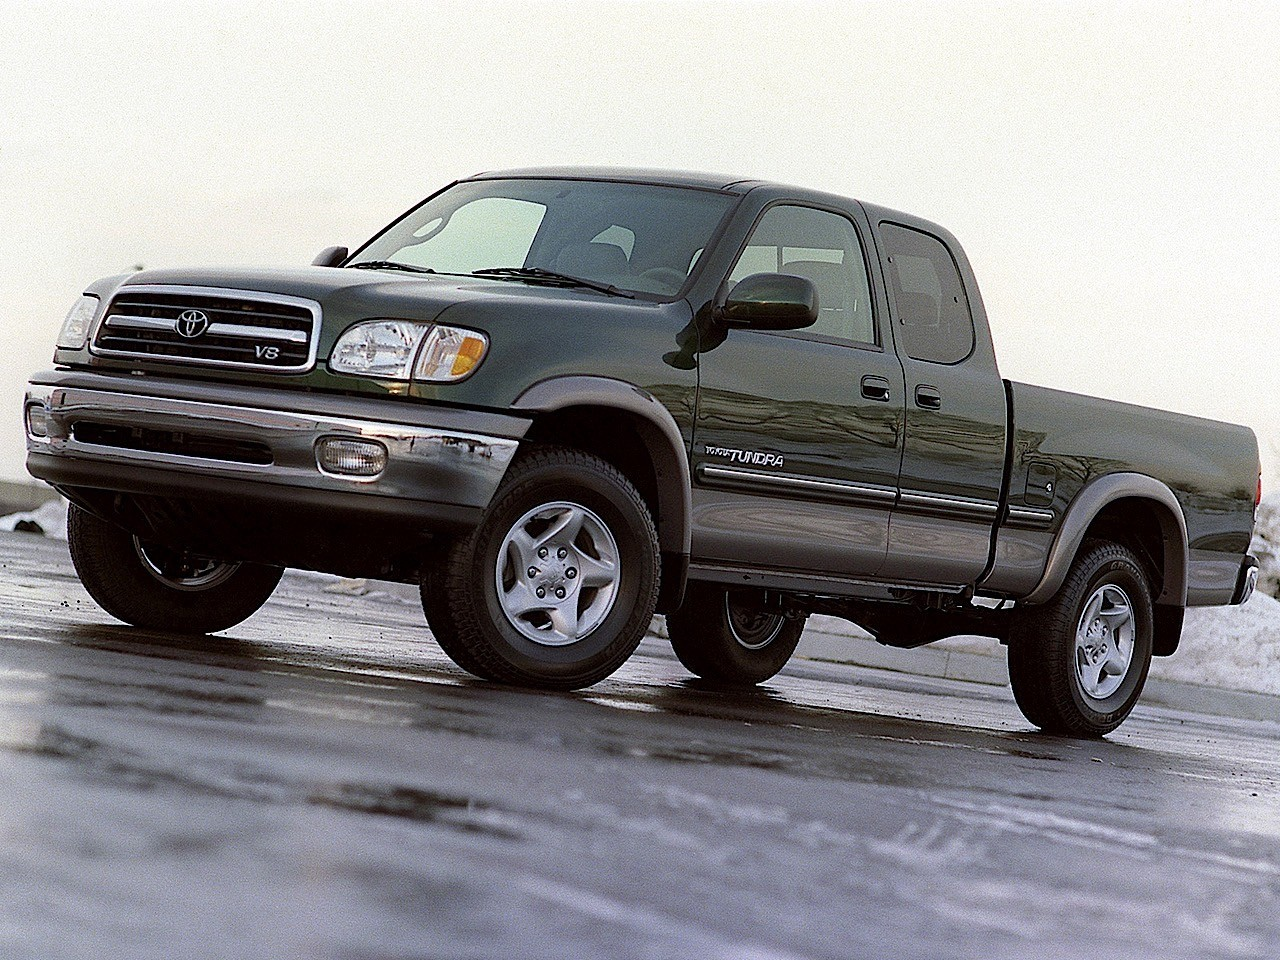 Toyota Tundra Access Cab Specs 1999 2000 2001 2002